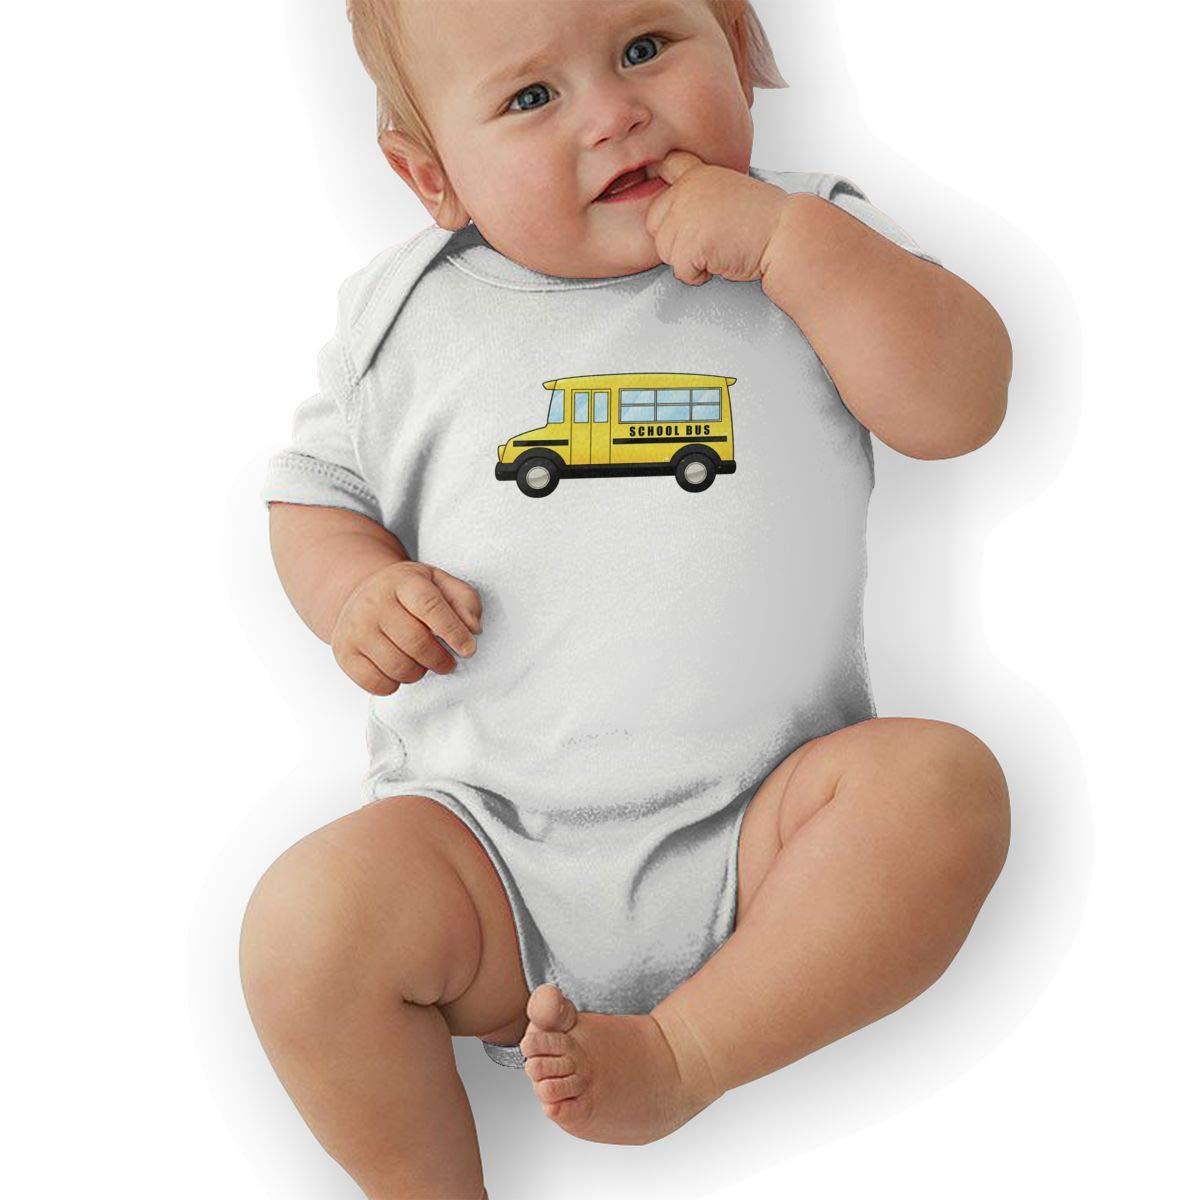 School Bus Newborn Baby Short Sleeve Romper Infant Summer Clothing